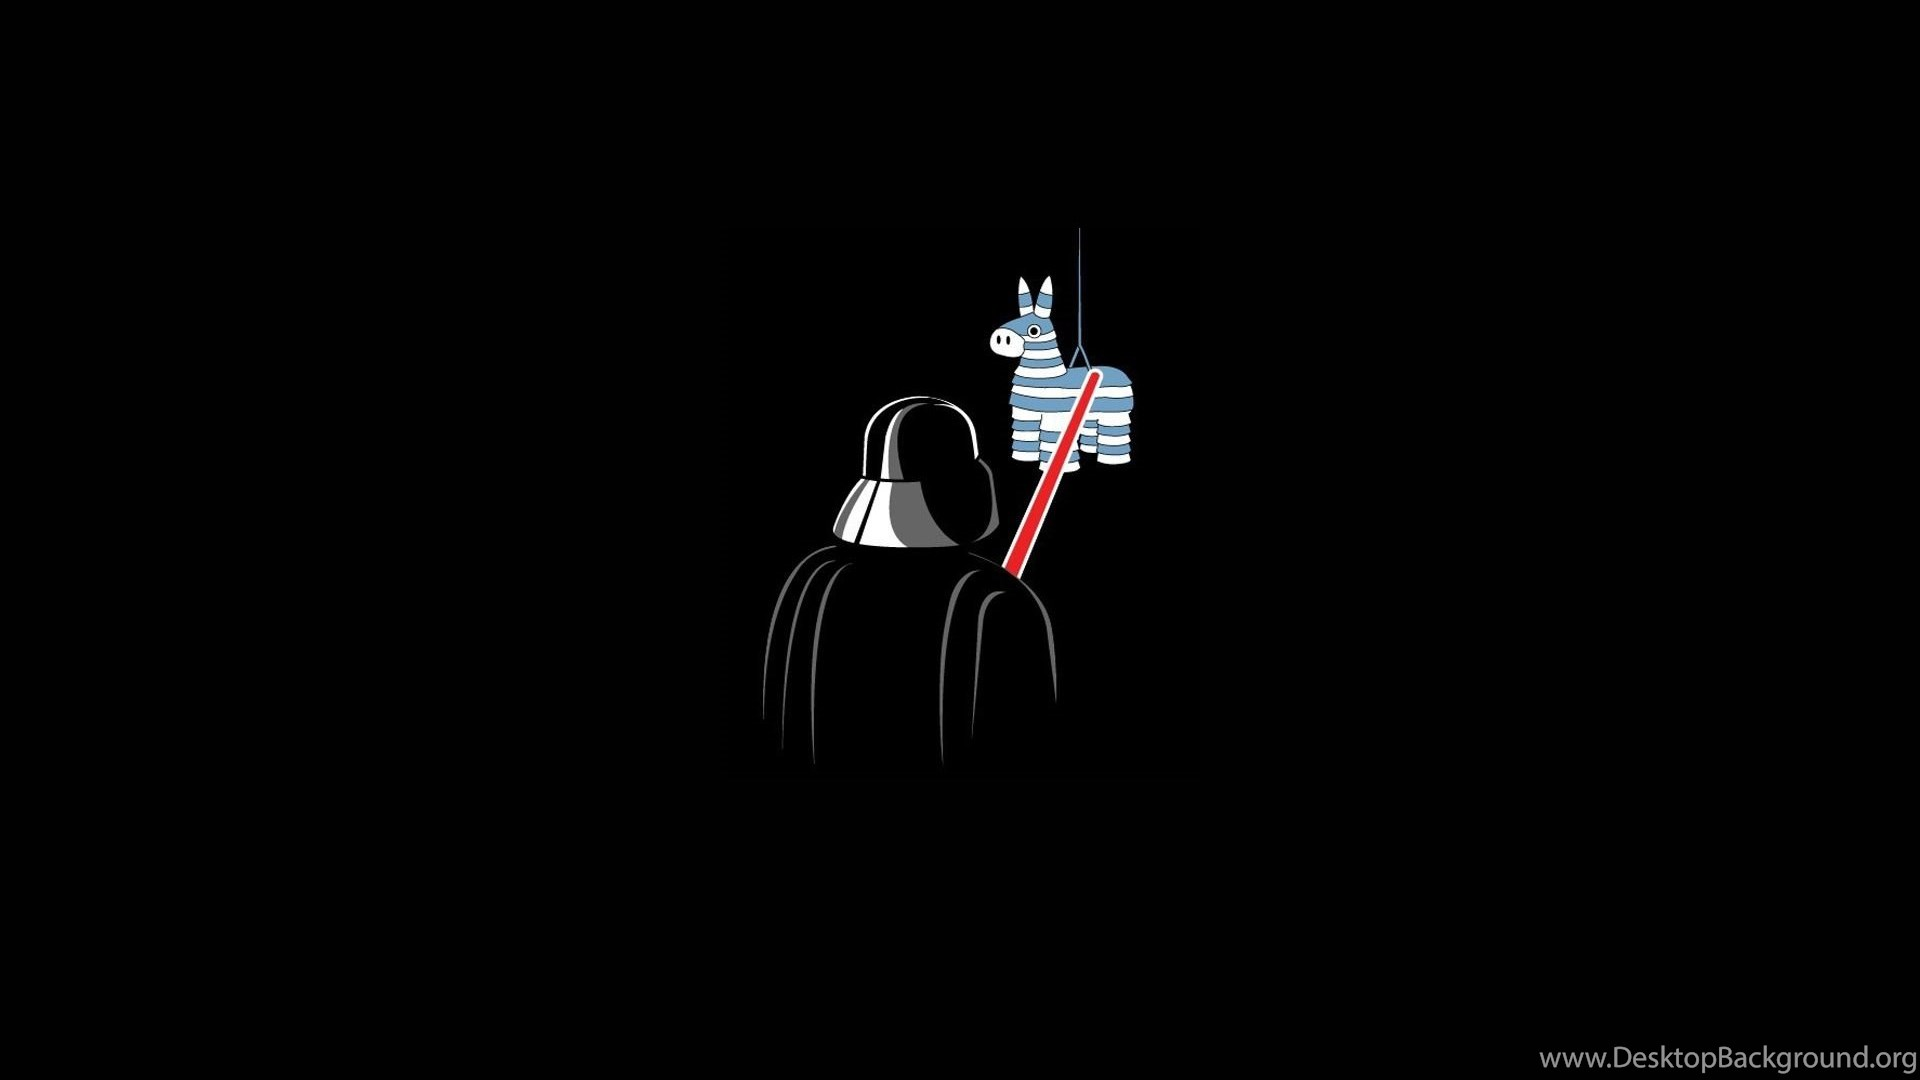 Funny Star Wars Wallpapers Hd 10 Jpg Desktop Background